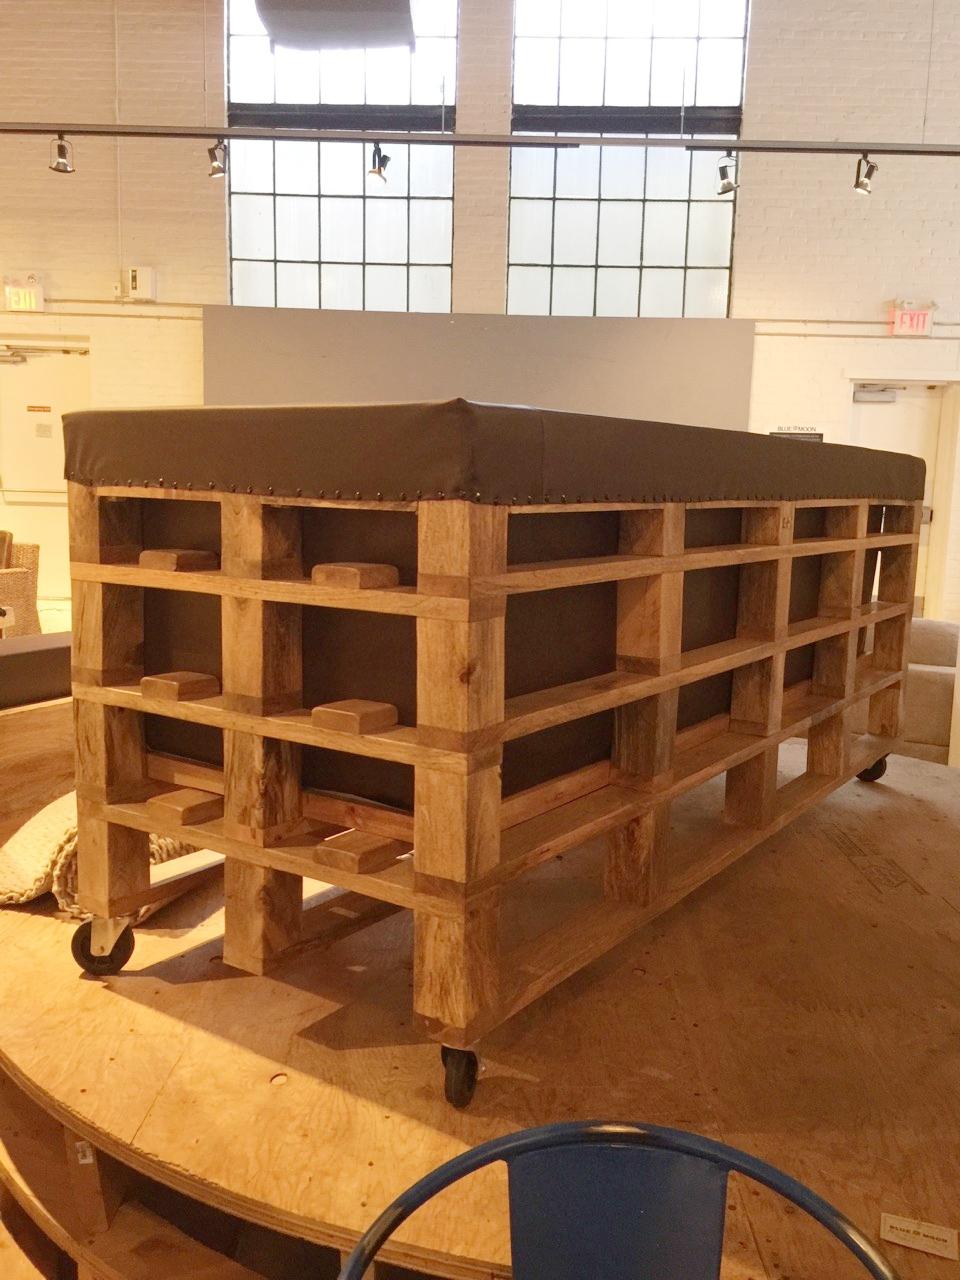 Copy of deconstructed furniture. Crate furniture. industrial furniture